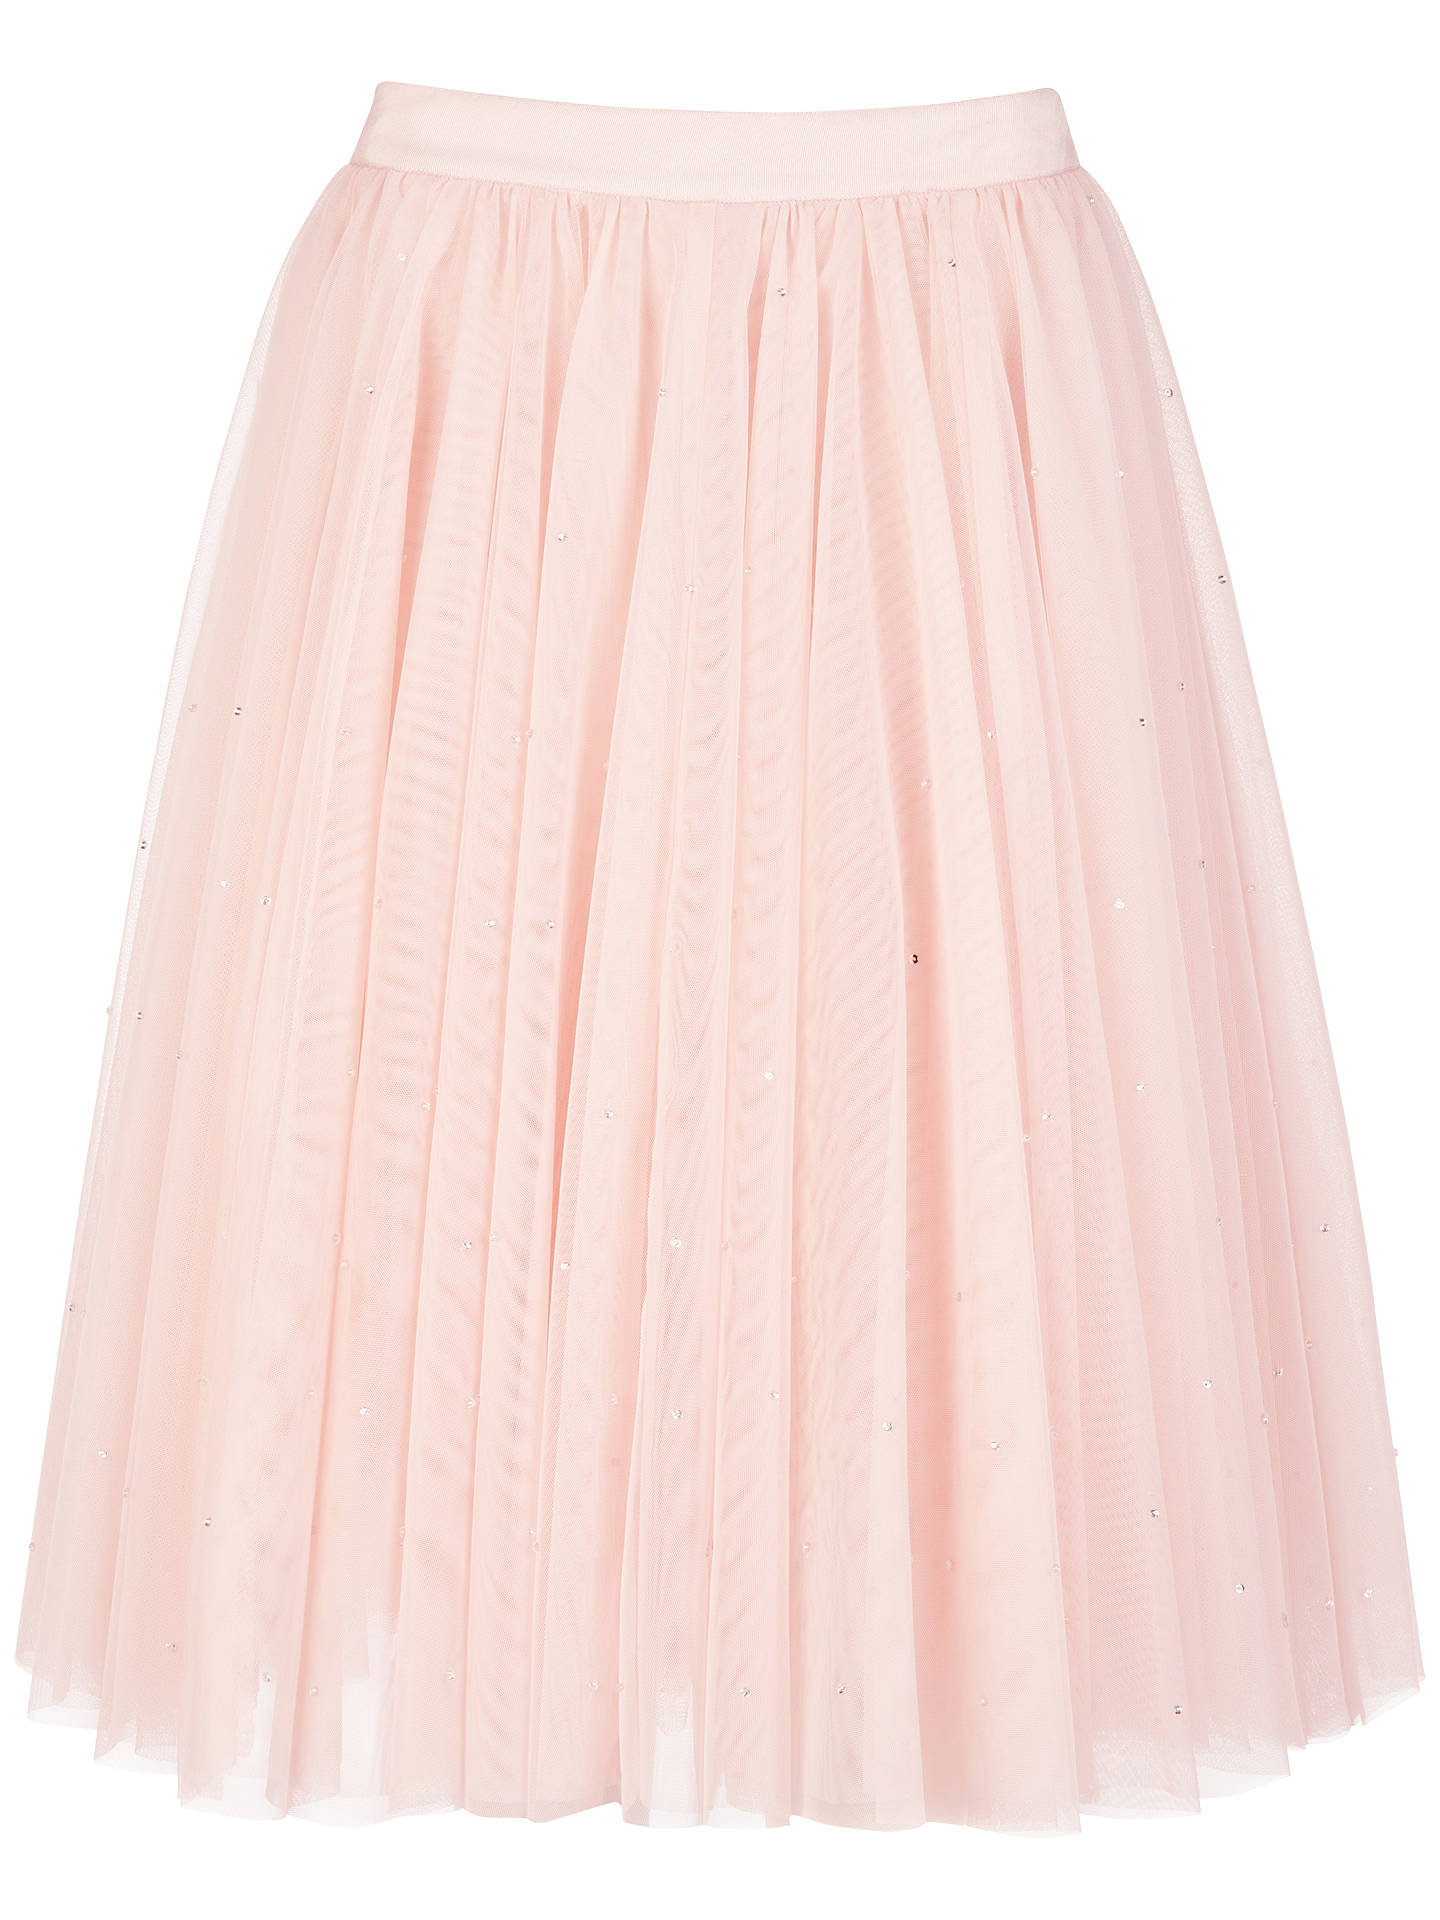 33187a135 Buy Ted Baker Odella Netted Tutu Skirt, Pale Pink, 6 Online at johnlewis.